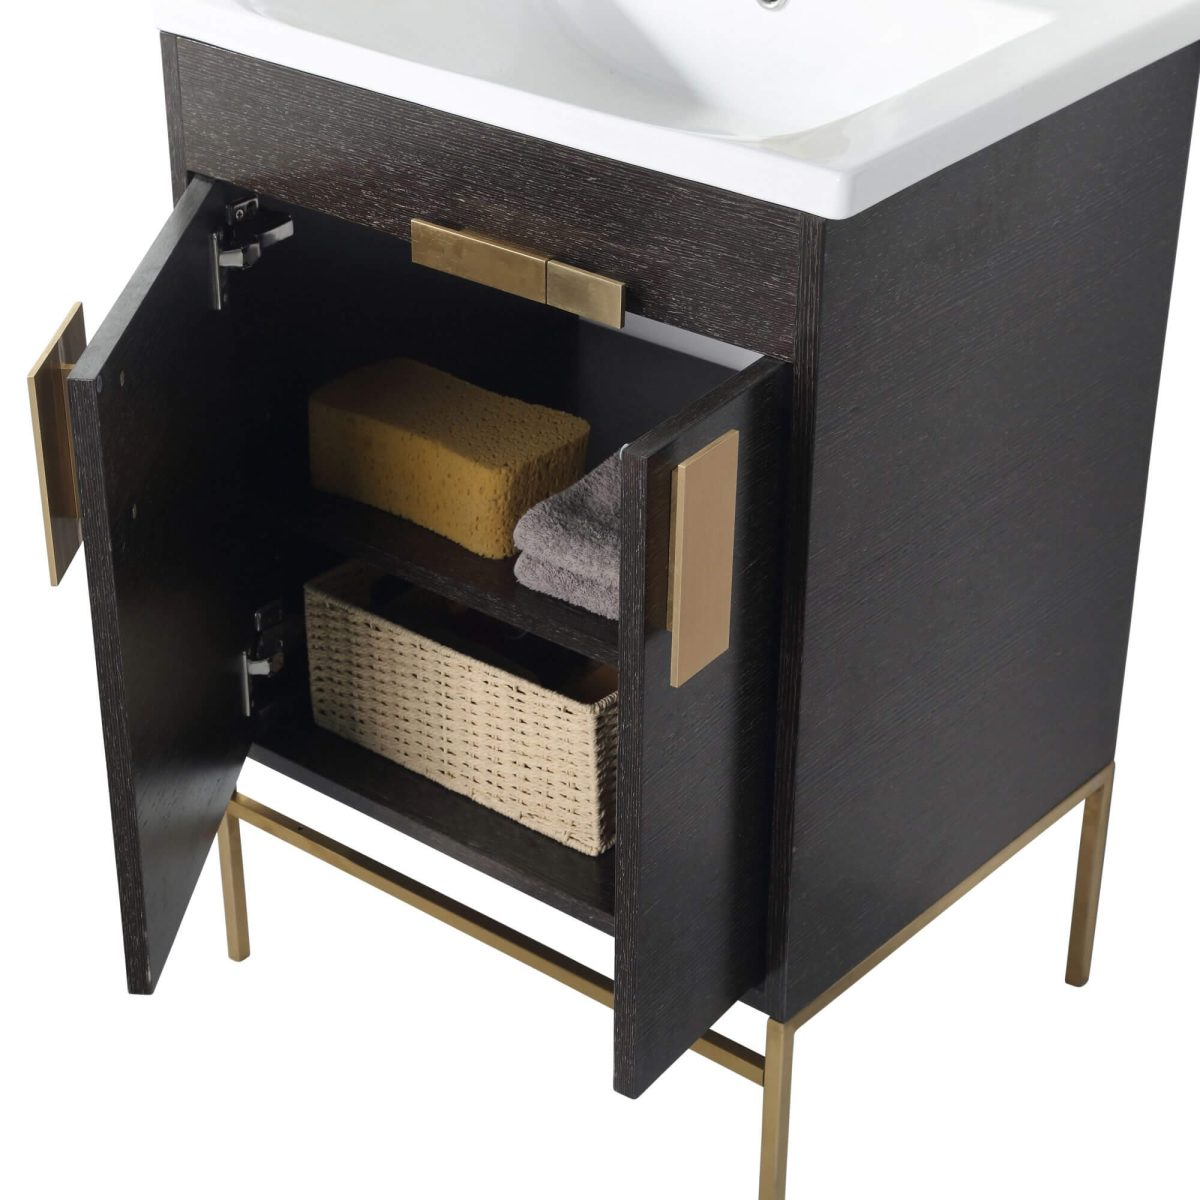 "Shawbridge 24"" Modern Bathroom Vanity  Black Oak Straight Grain with Satin Brass Hardware"